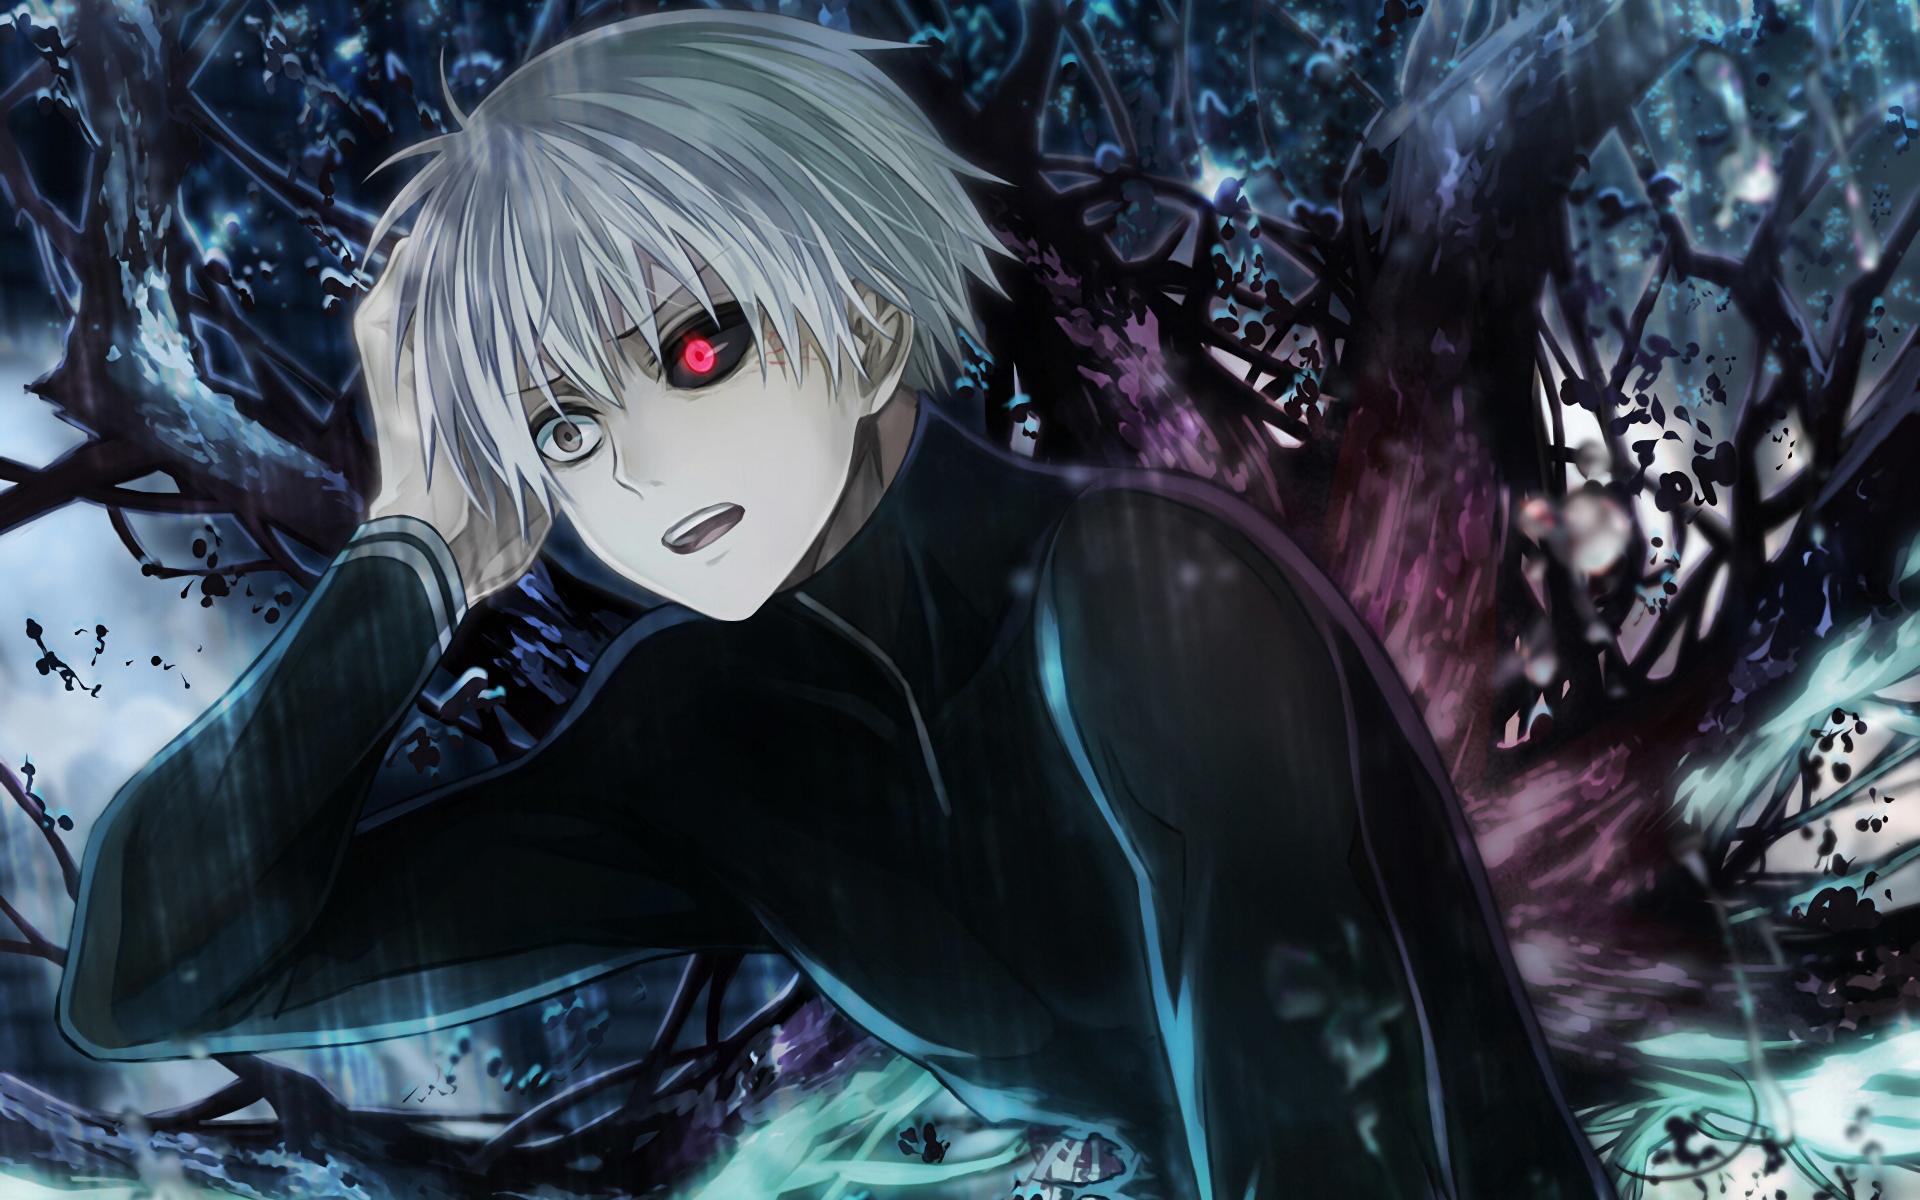 Tokyo ghoul fondo de pantalla hd fondo de escritorio for Imagenes anime hd full